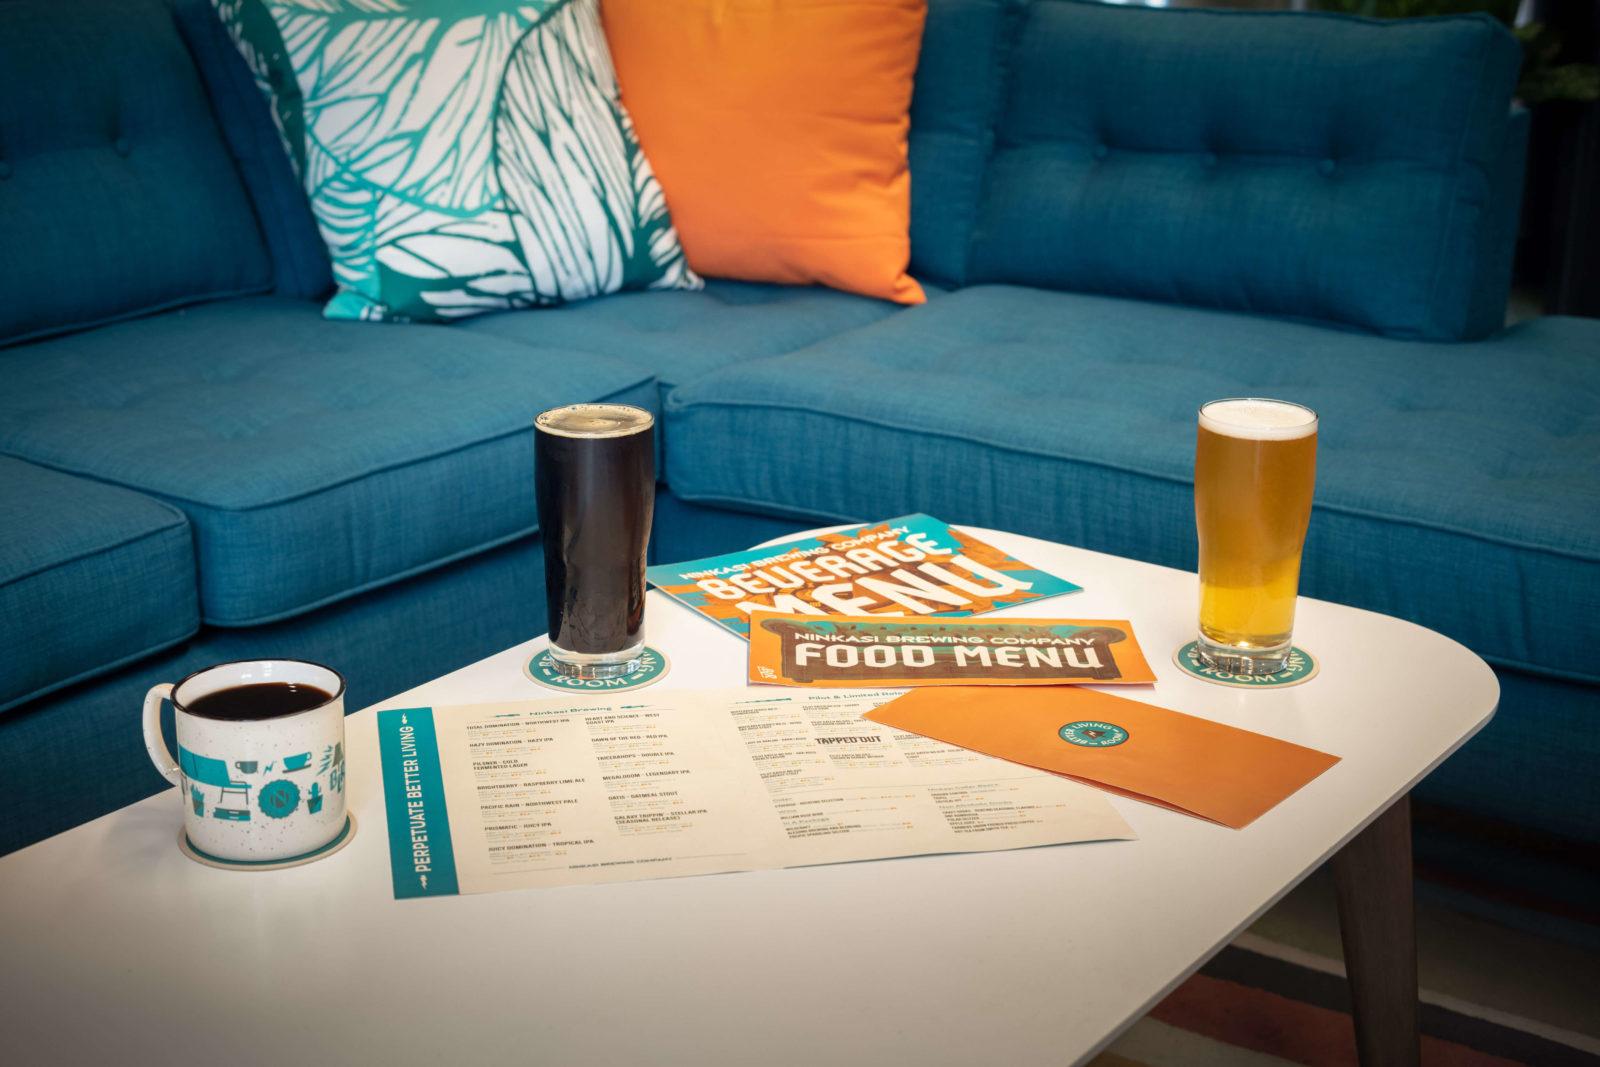 Ninkasi-Better Living Room Beer Table